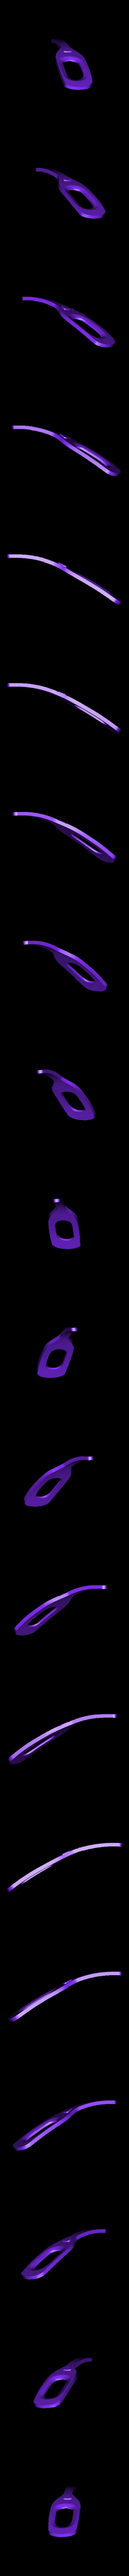 azuro_top3.stl Download free STL file Azuro Computer Mouse • 3D printer model, MaxMKA